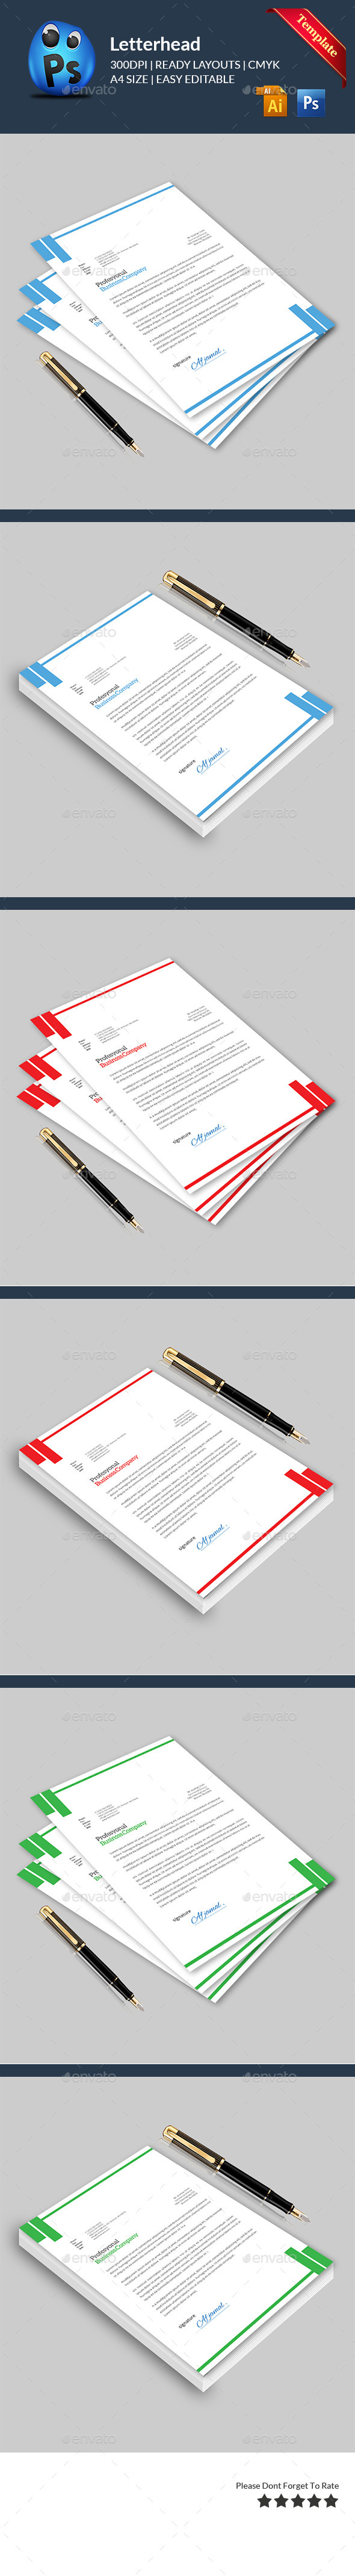 GraphicRiver Letterhead Print Templates 11562967